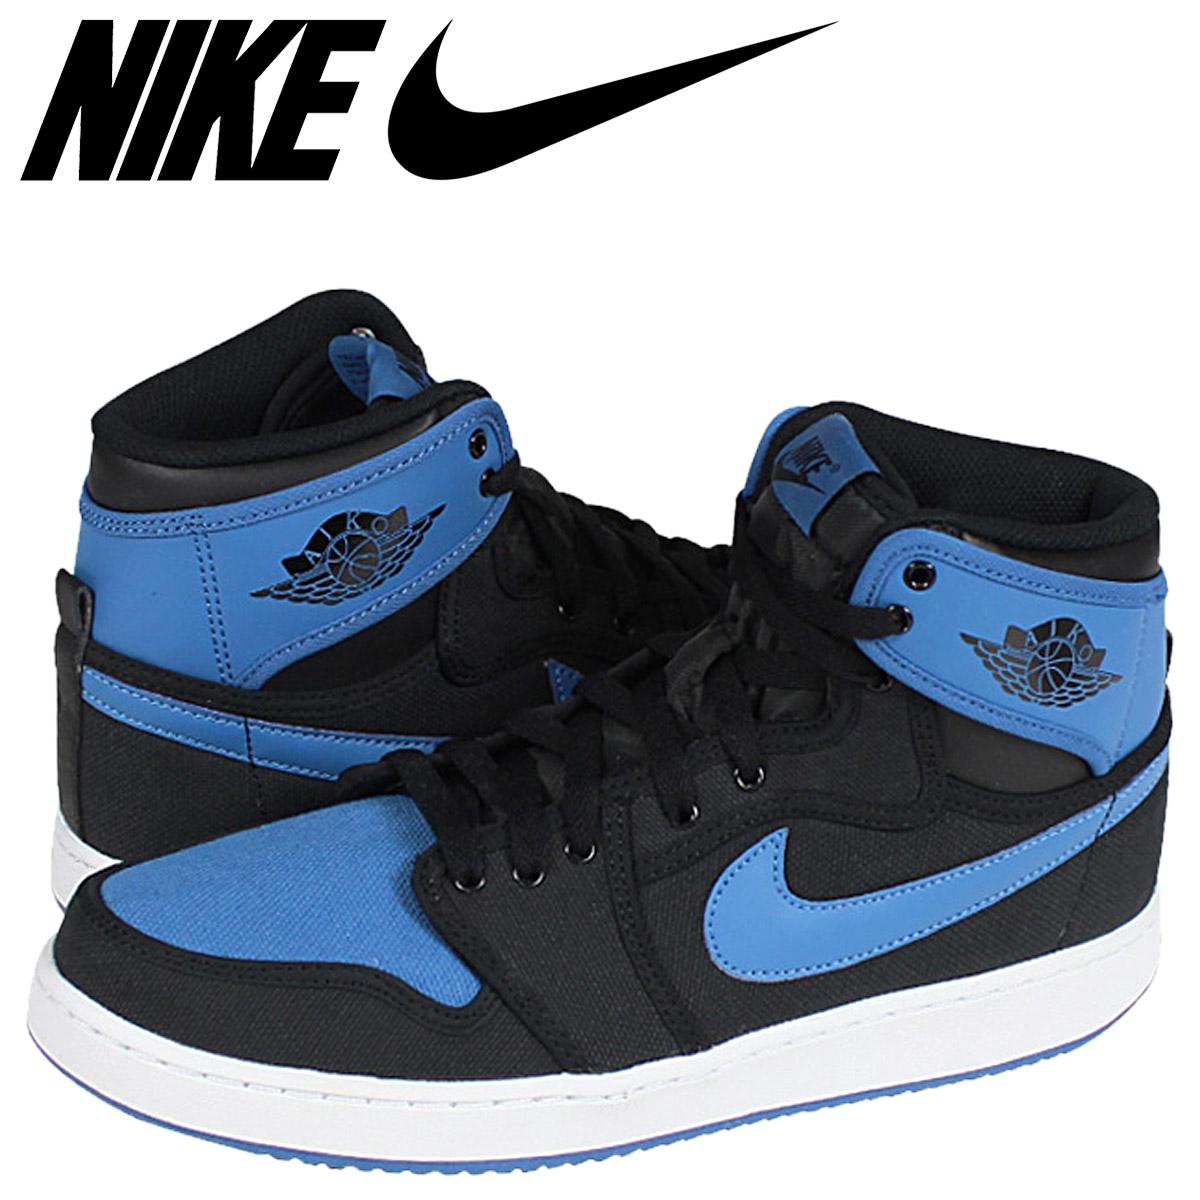 de075463b3f4c8 Whats up Sports   SOLD OUT  Nike NIKE AIR JORDAN 1 KO HIGH OG ...